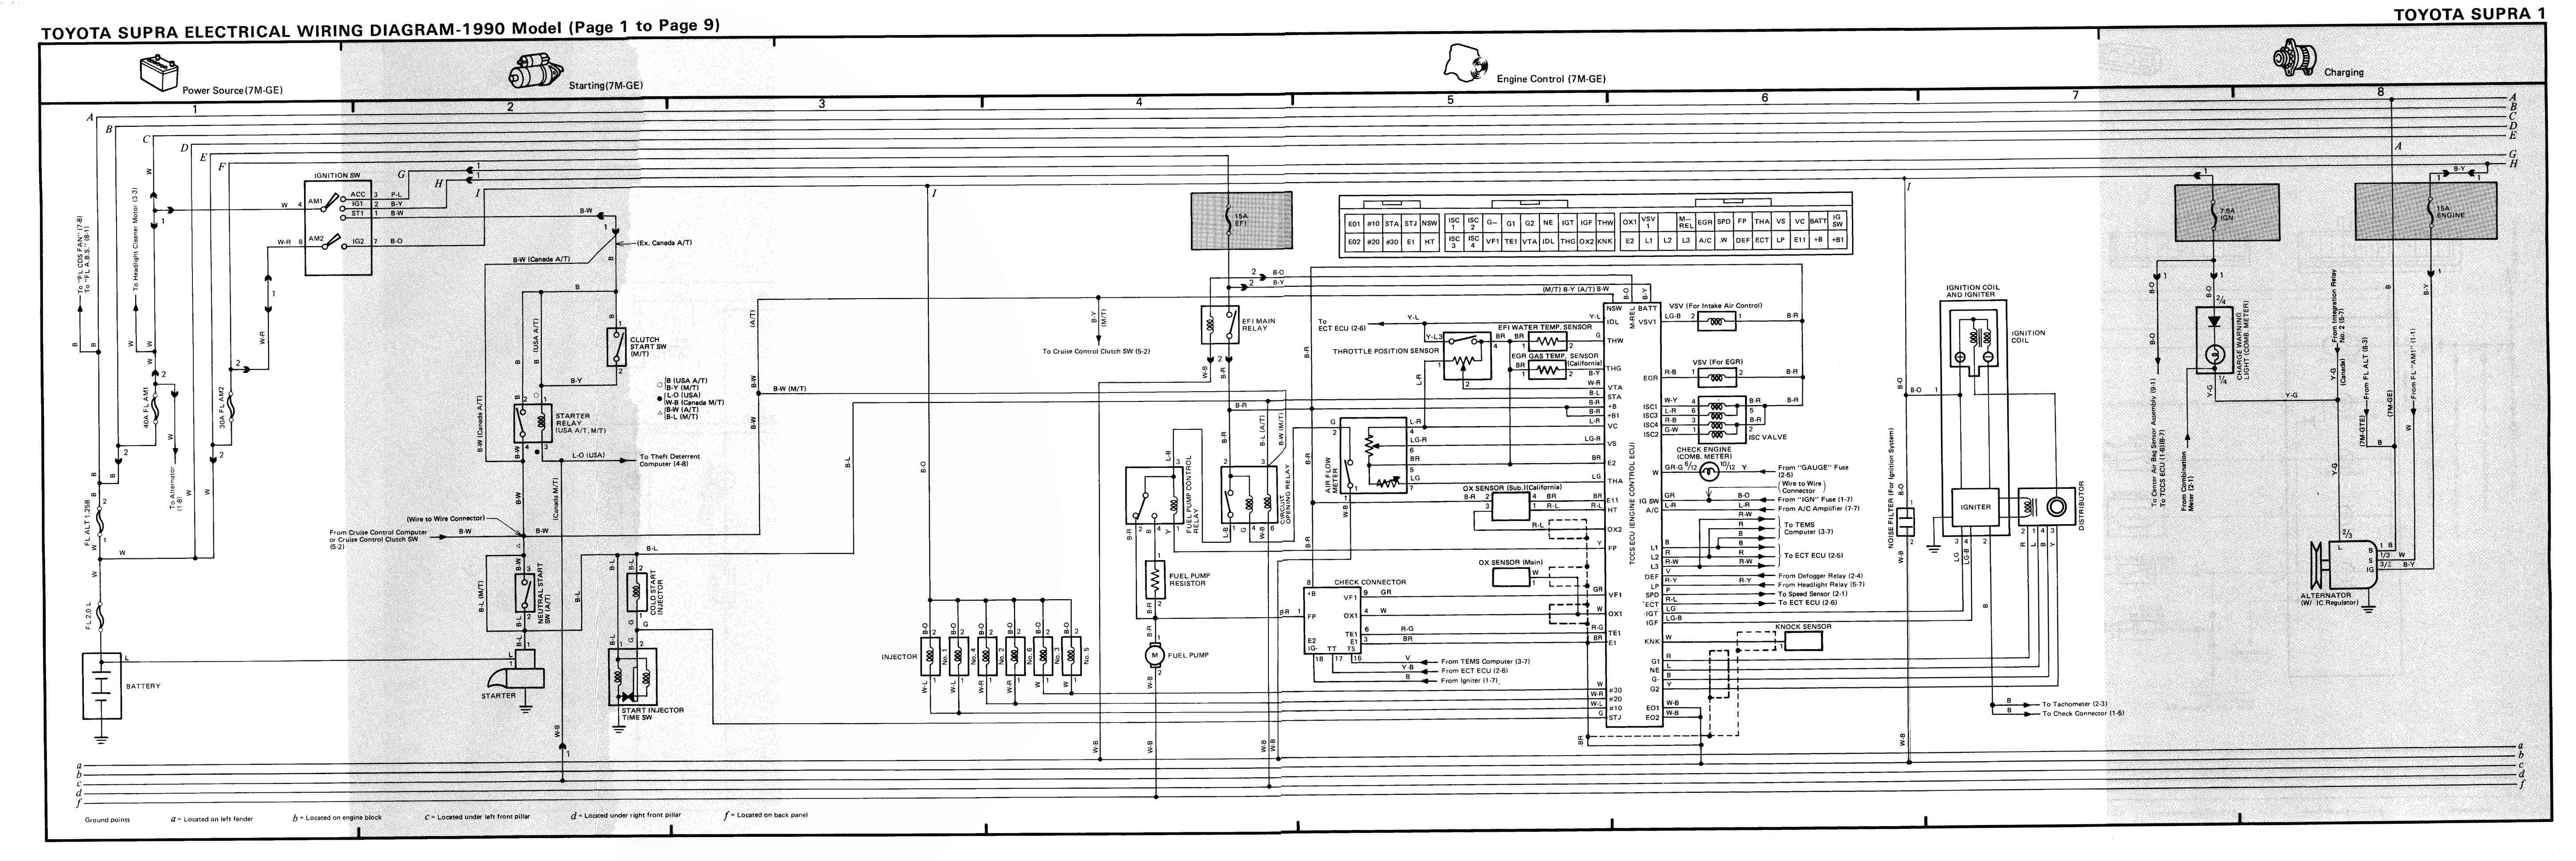 lexus ls430 wiring diagrams lexus es300 wiring diagram